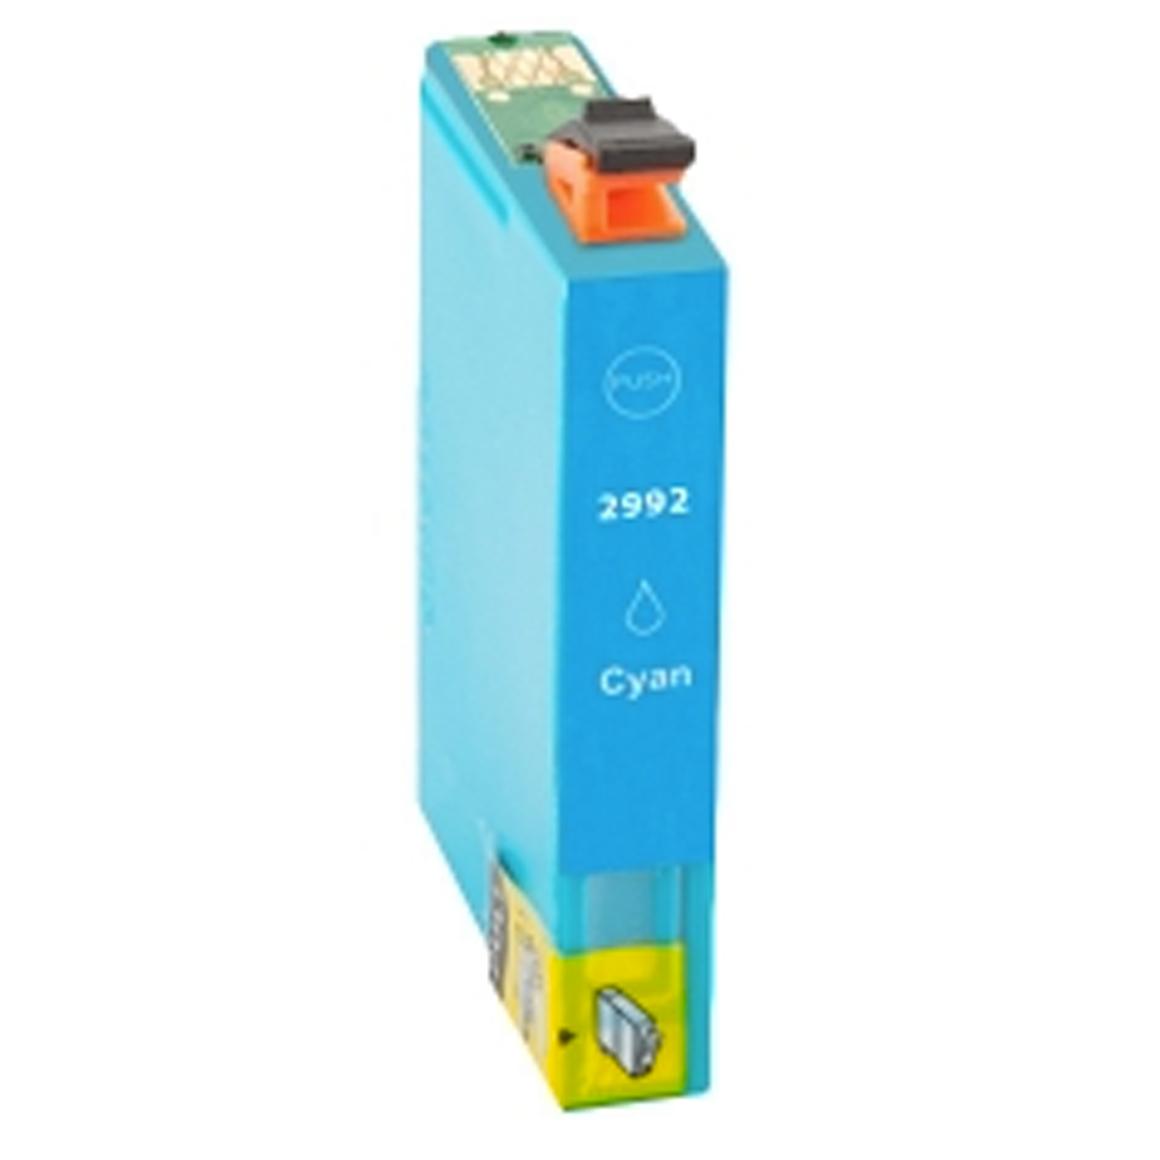 Afbeelding van Epson Expression Home XP 257 inkt cartridge Cyan 29 Xl T2992 (huismerk inktcartridges)